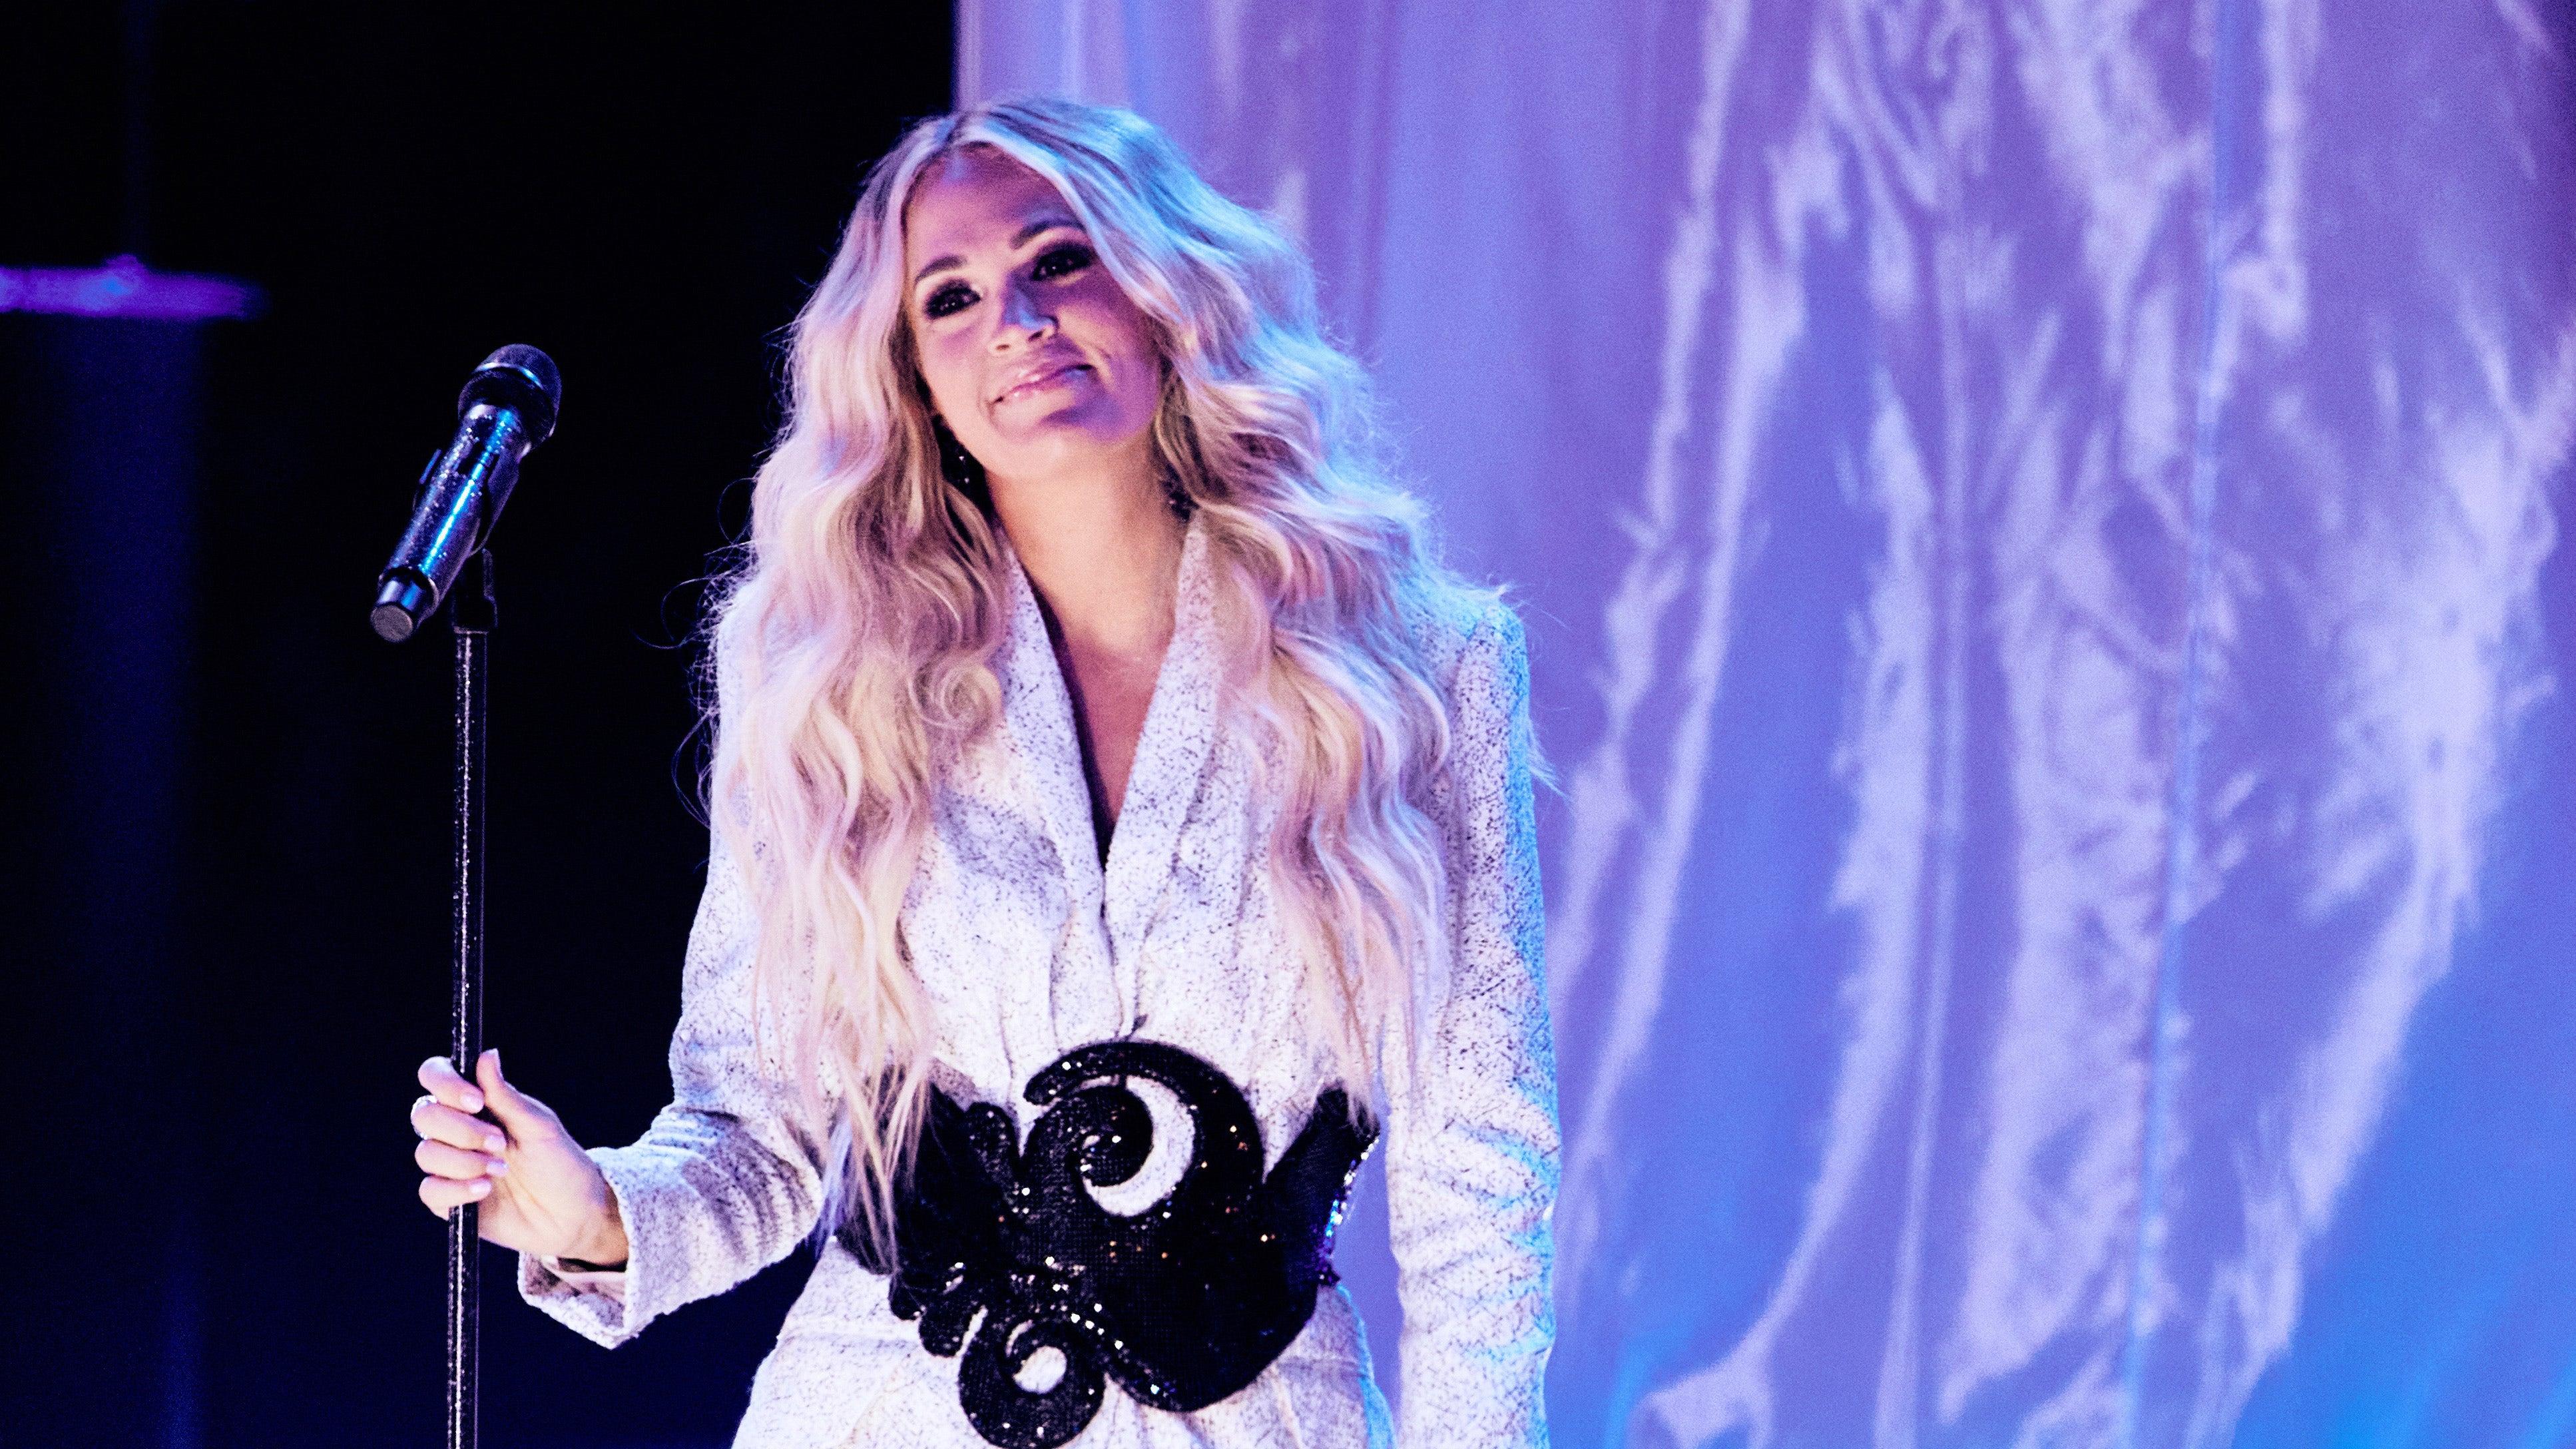 CMT Music Awards 2021 sees Carrie Underwood and John Legend take home top award Chris Stapleton perform – Fox News